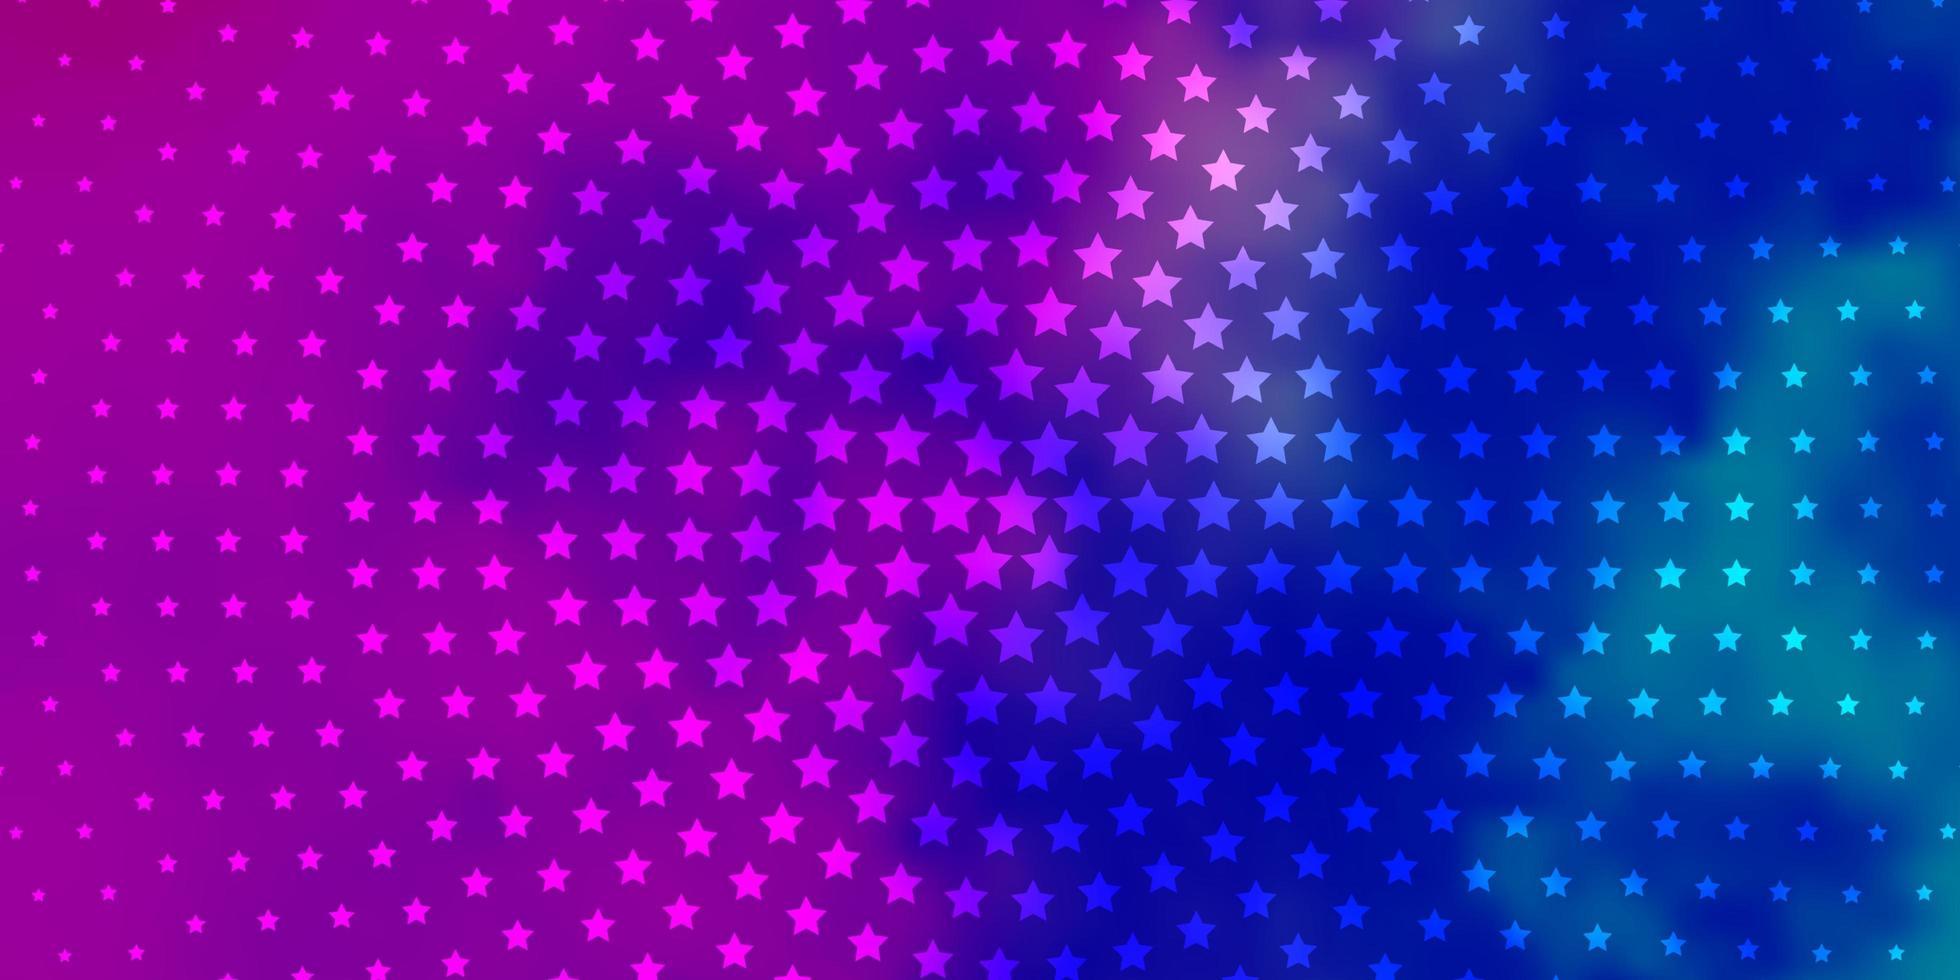 hellrosa, blaue Vektorschablone mit Neonsternen. vektor